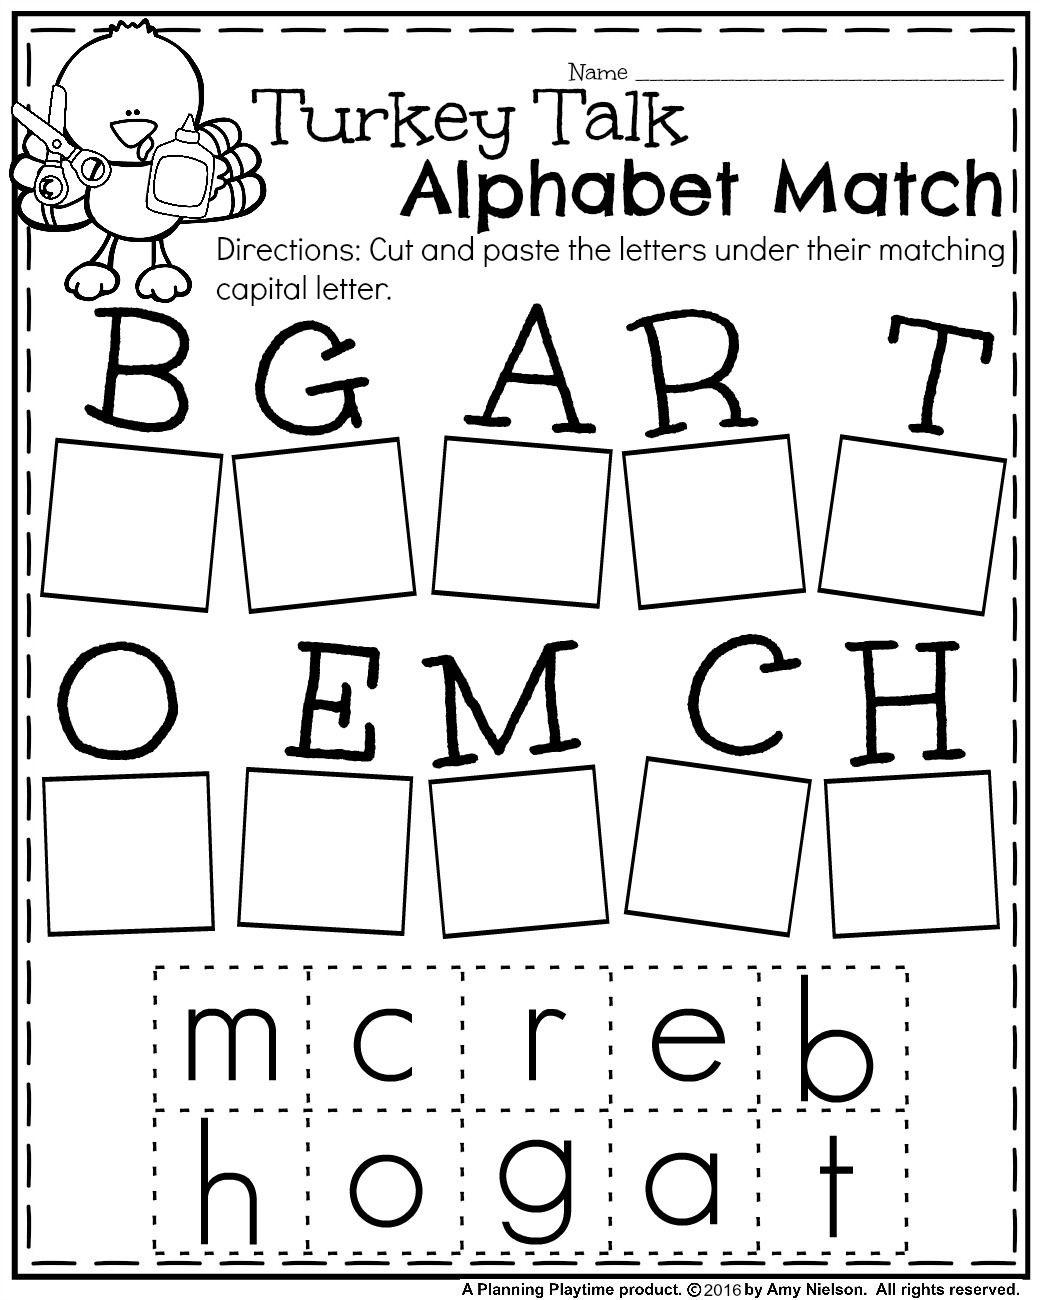 Fall Kindergarten Worksheets For November   Teachers Pay Teachers - Free Printable Kindergarten Worksheets Cut And Paste